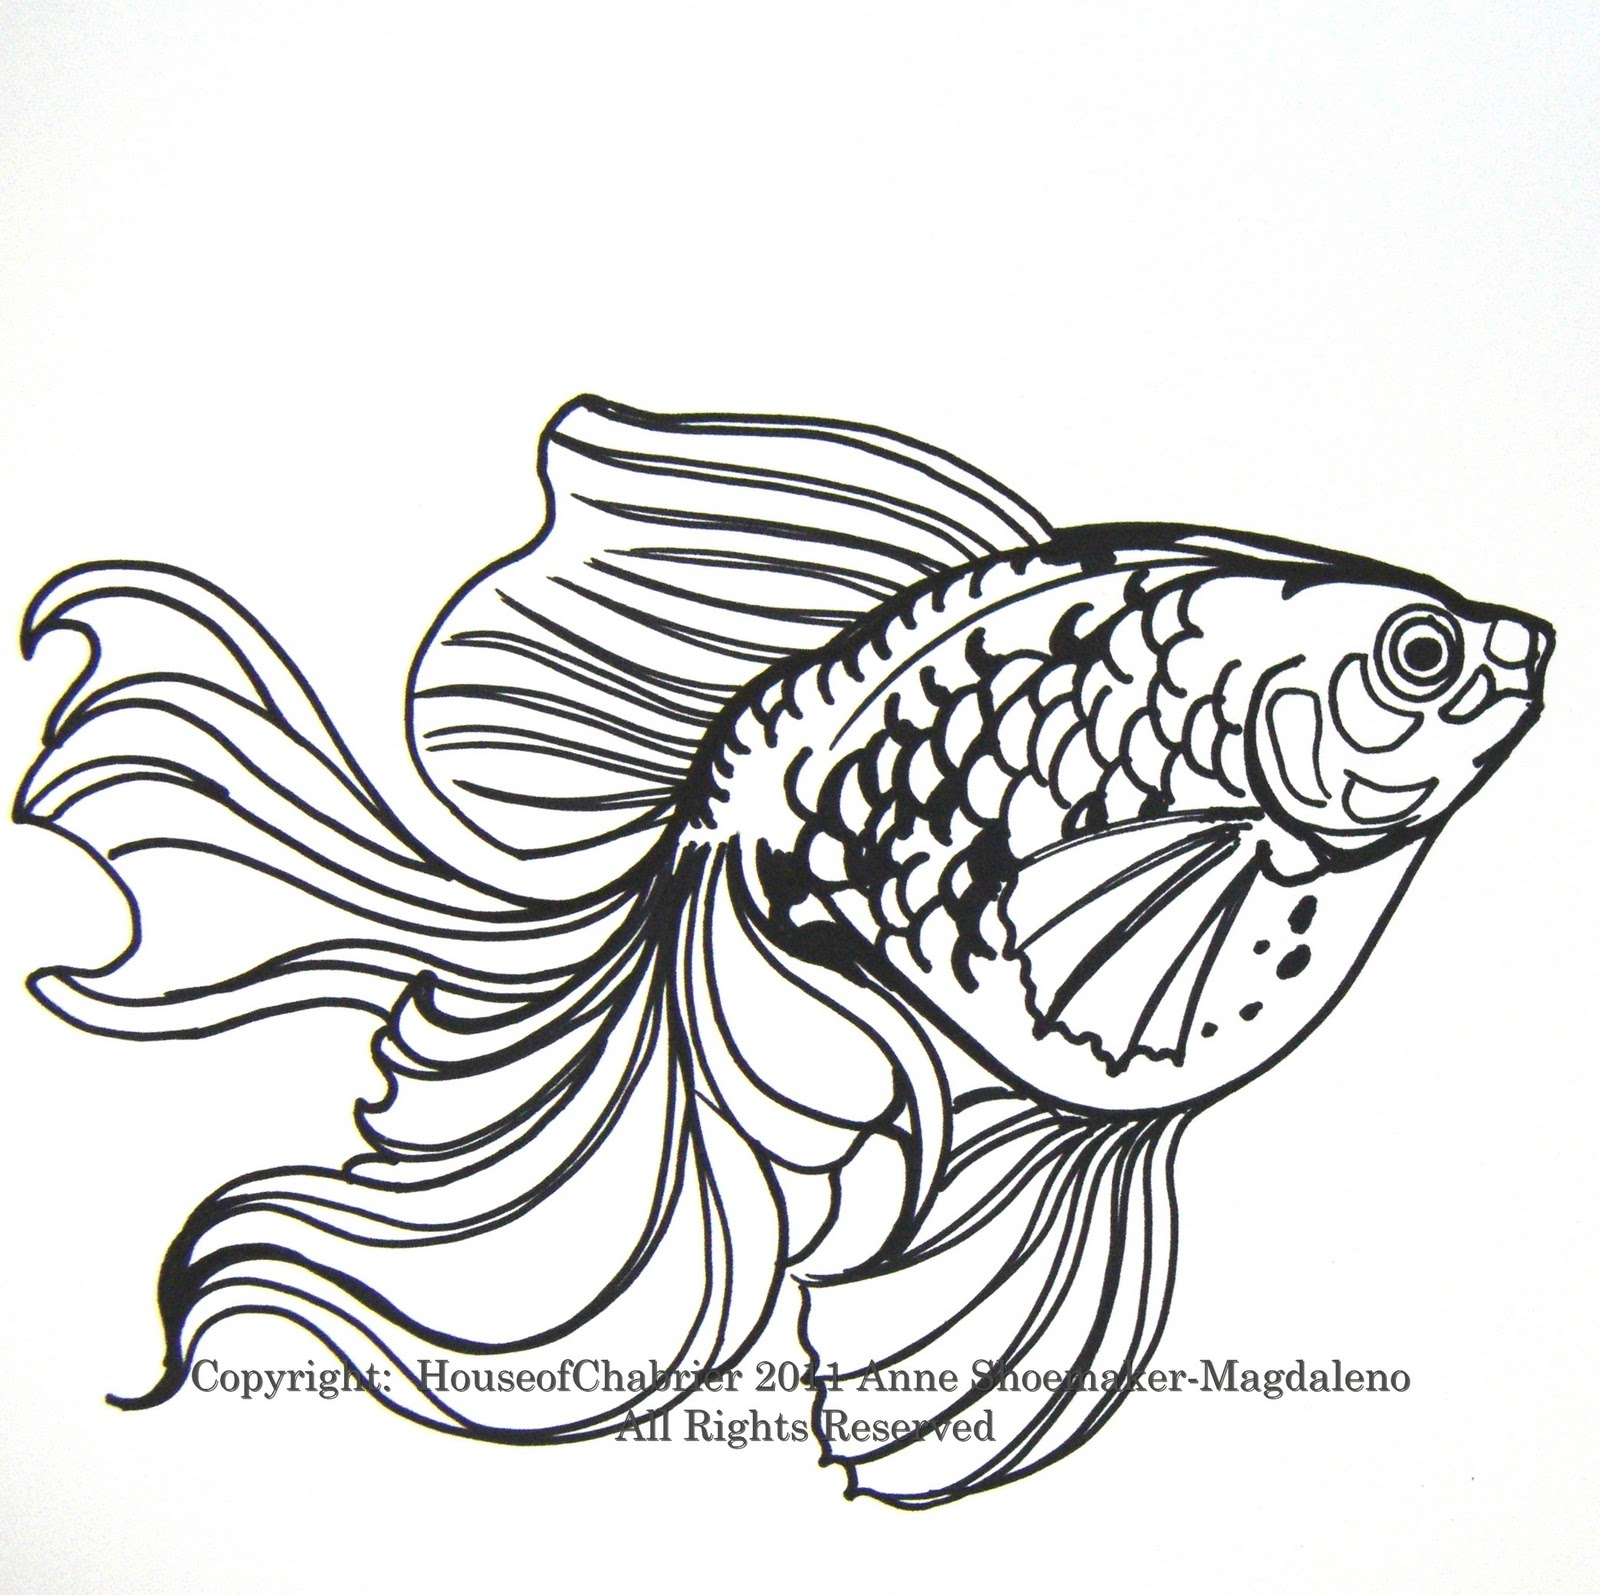 Goldfish line drawing - photo#29